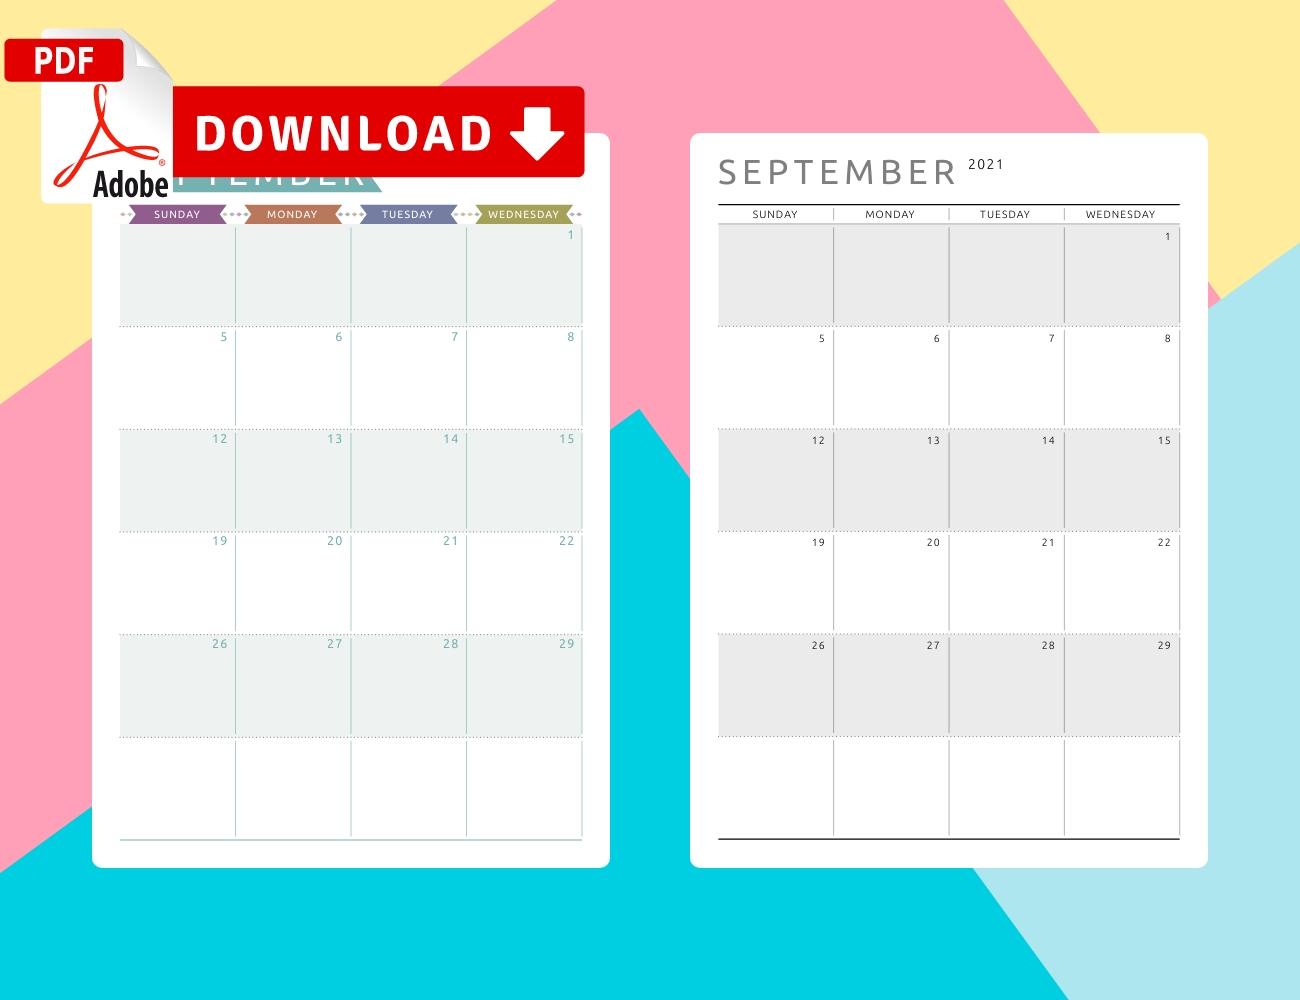 September 2021 Calendar Templates - Download Pdf September 2021 Calendar Template